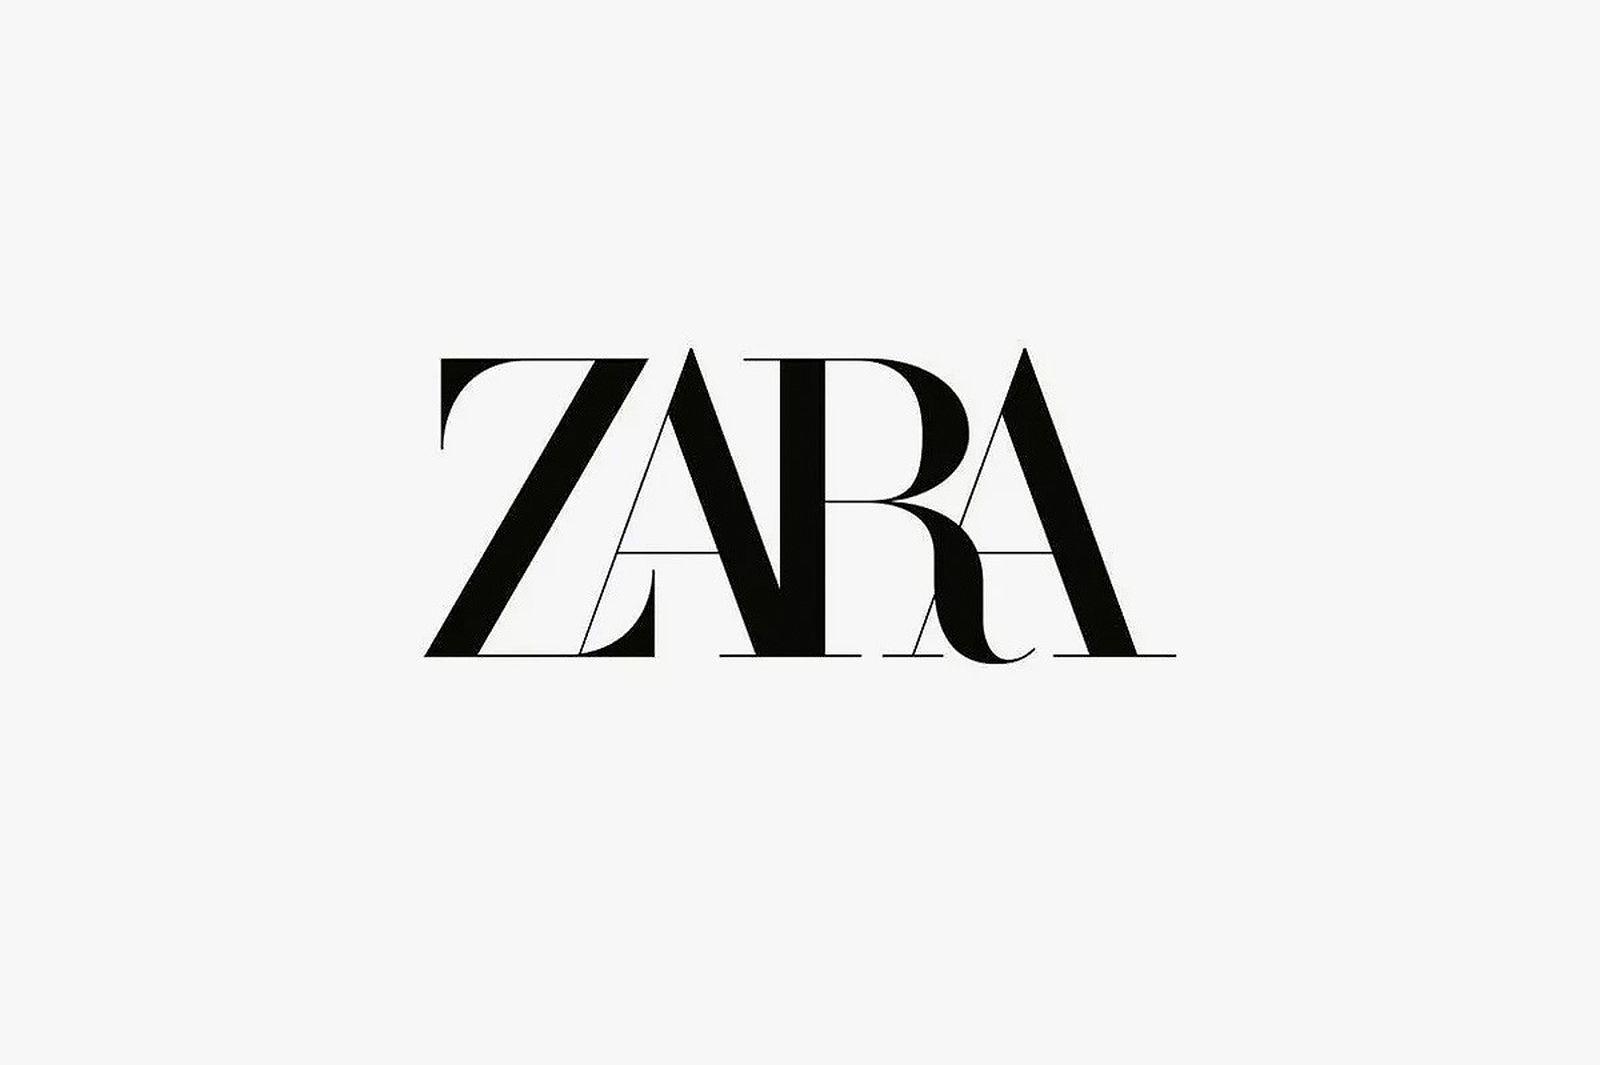 justin bieber streetwear zara logo best comments roundup 2000s trends Aquaman Balenciaga